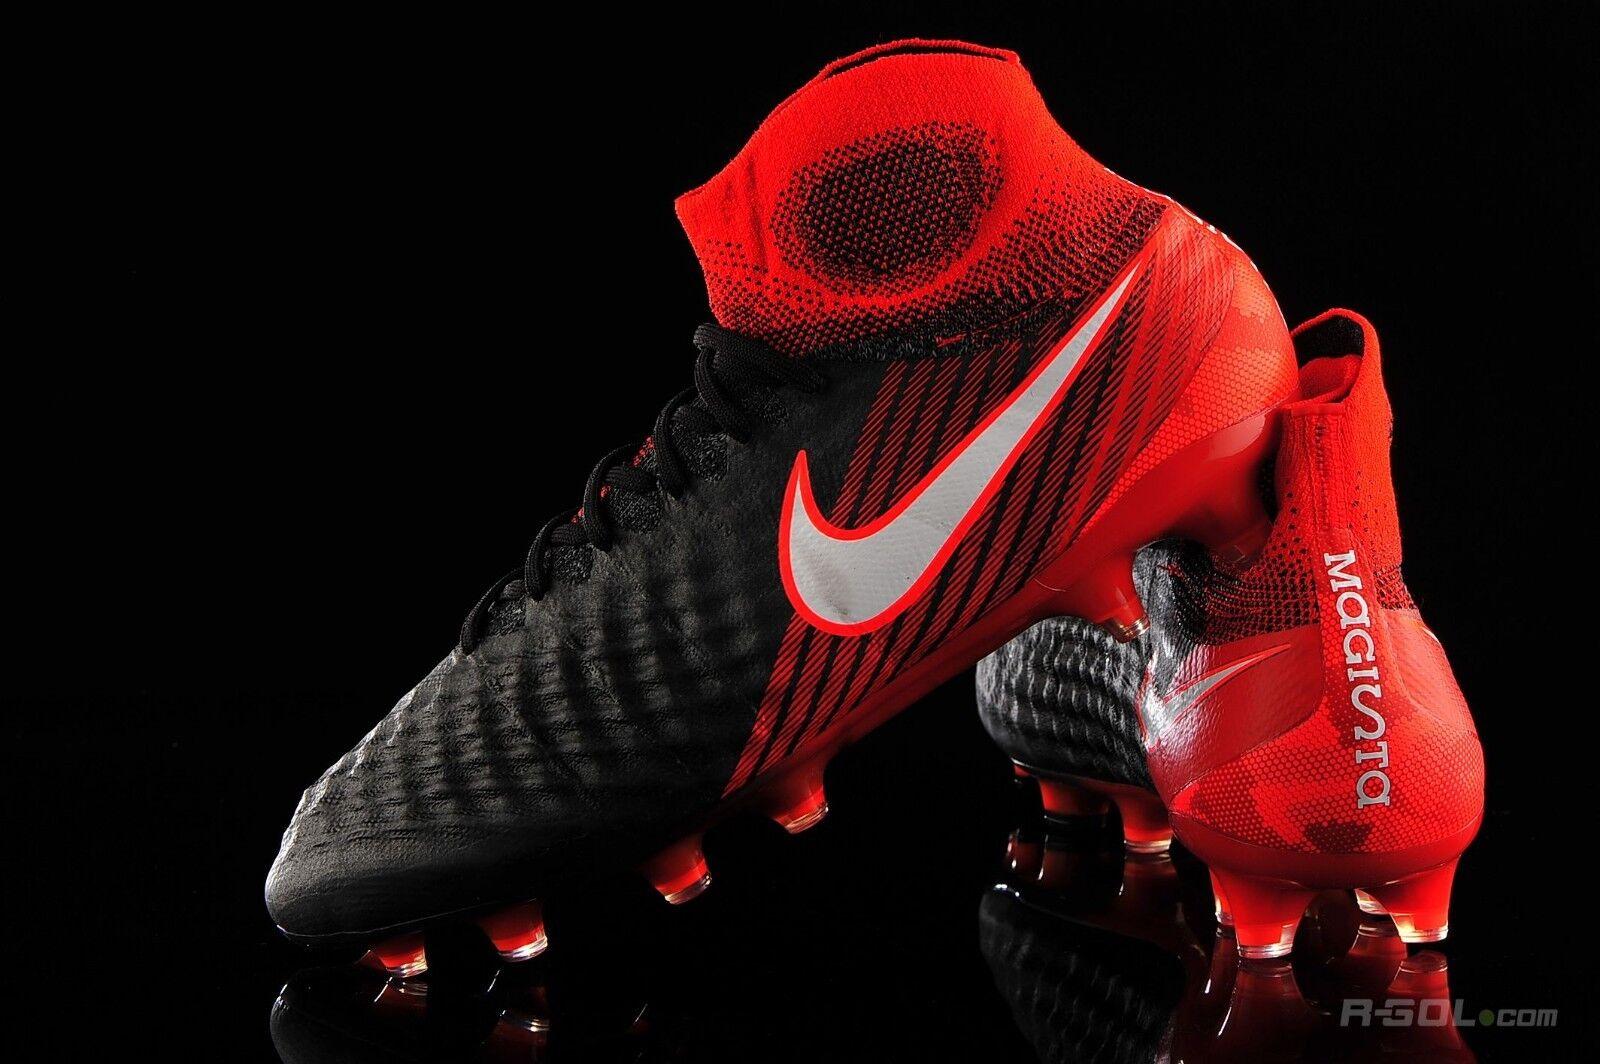 Nike Magista obra II DF FG Botines De Fútbol Negro Rojo Talla 8.5 (844595-061)